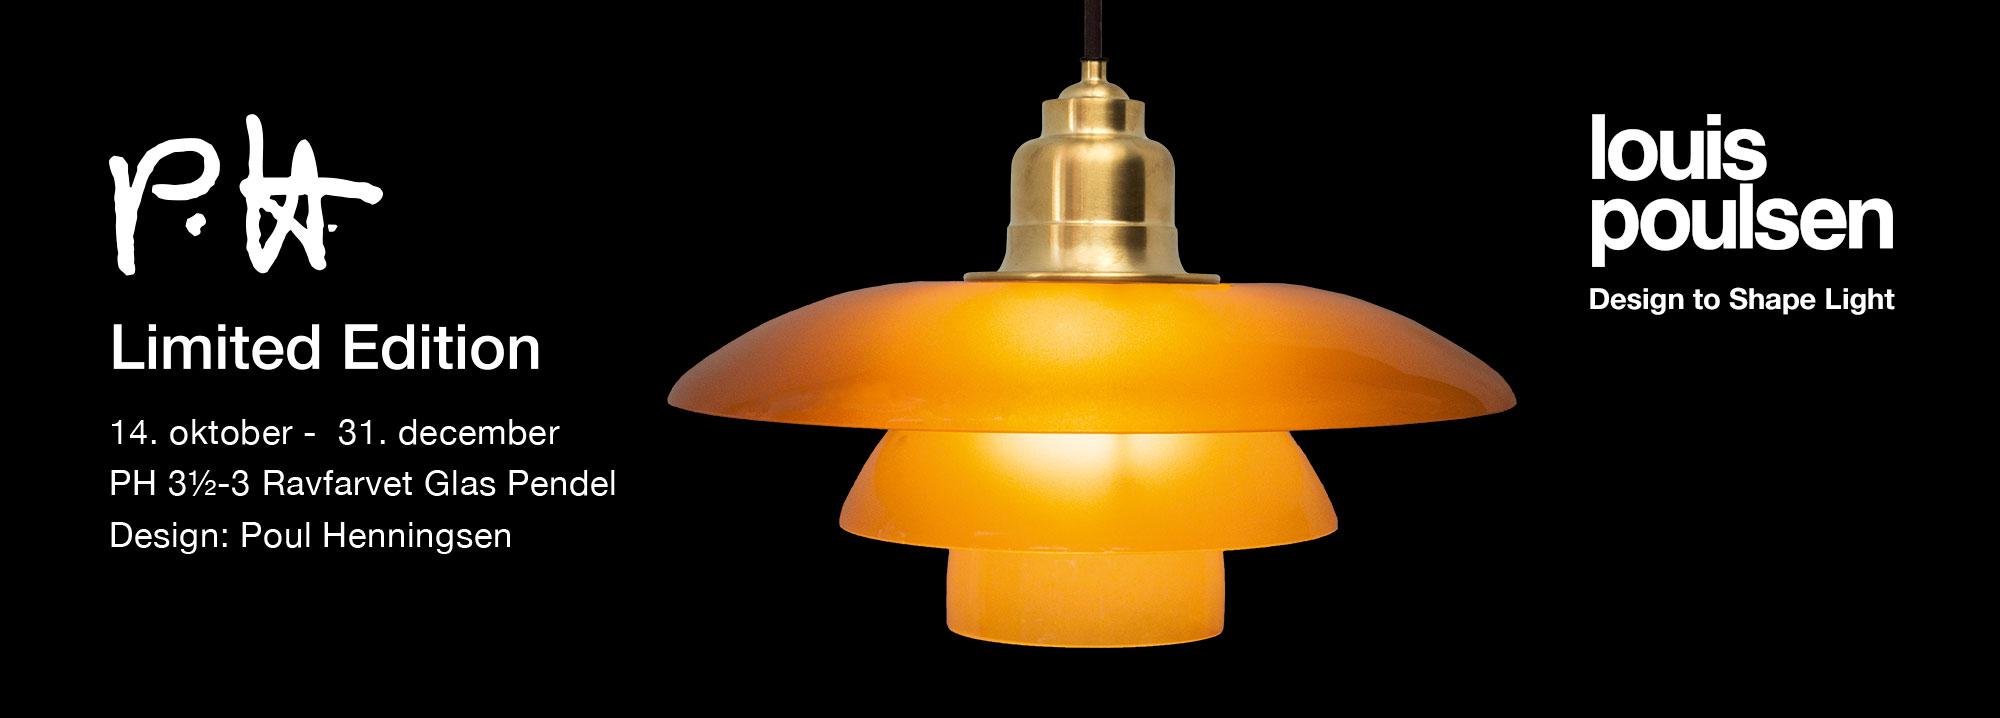 Ph Lampe Pris. Gallery Of Ph Artichoke Pendant Lamp With Ph Lampe Pris. Finest Ph Glas Pendel ...